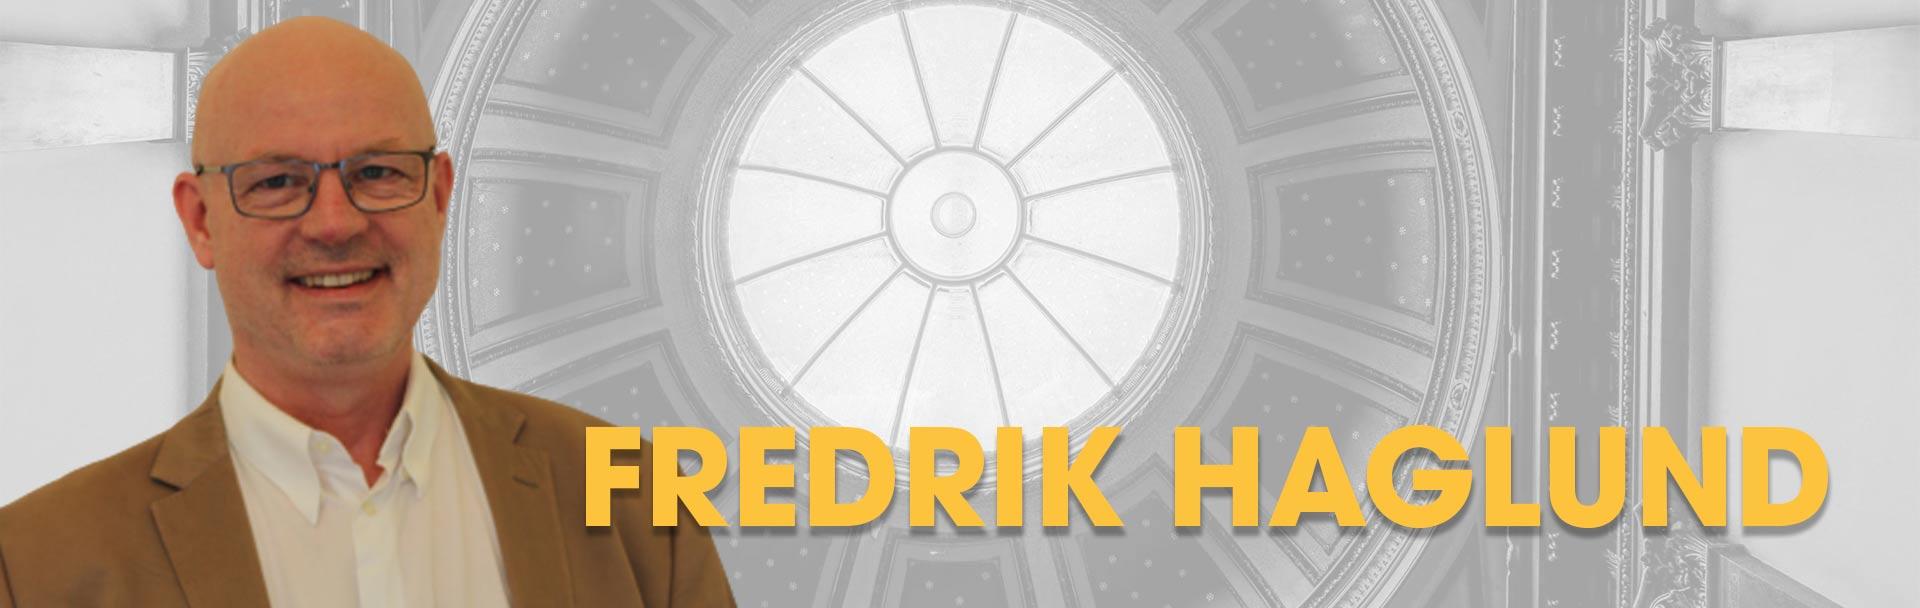 Fredrik Haglund is part of Saturday Night Demonstrations of Mediumship at the Sir Arthur Conan Doyle Centre